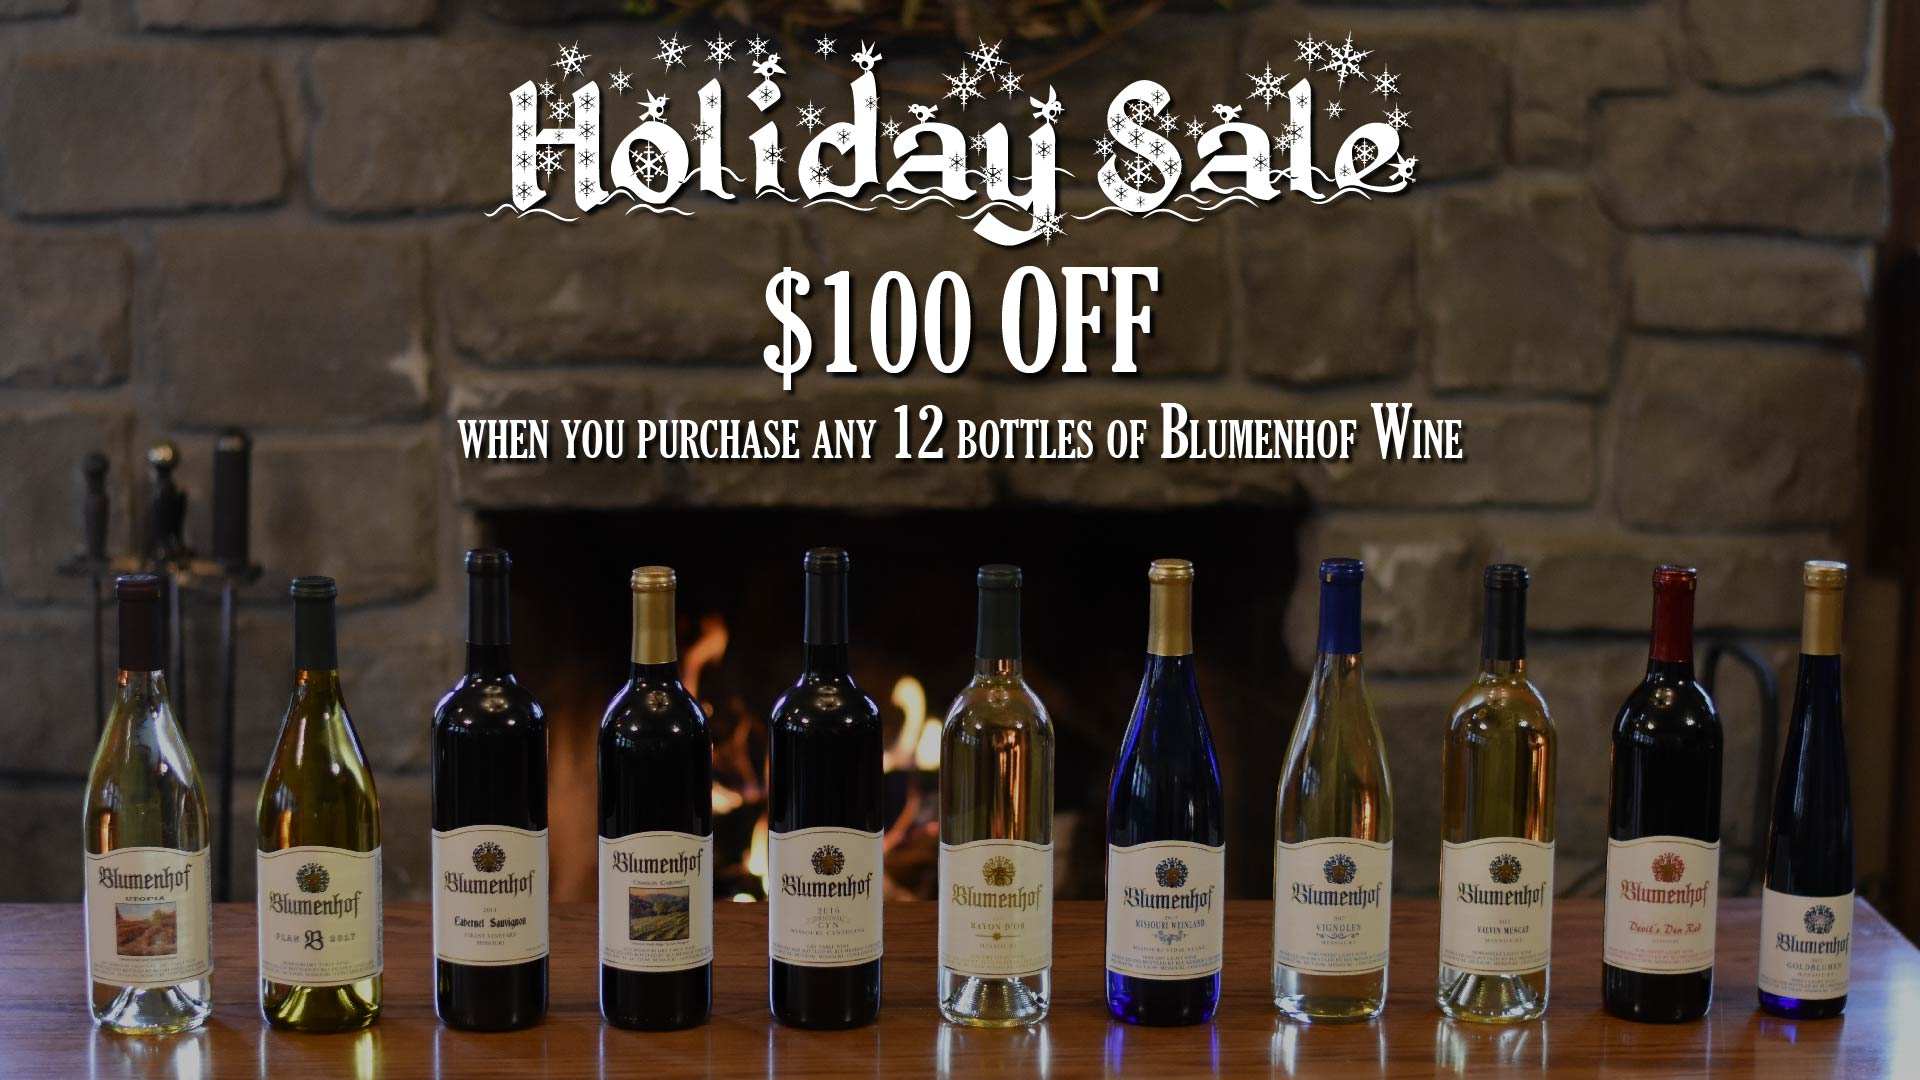 Blumenhof Winery's 2018 Holiday Sale